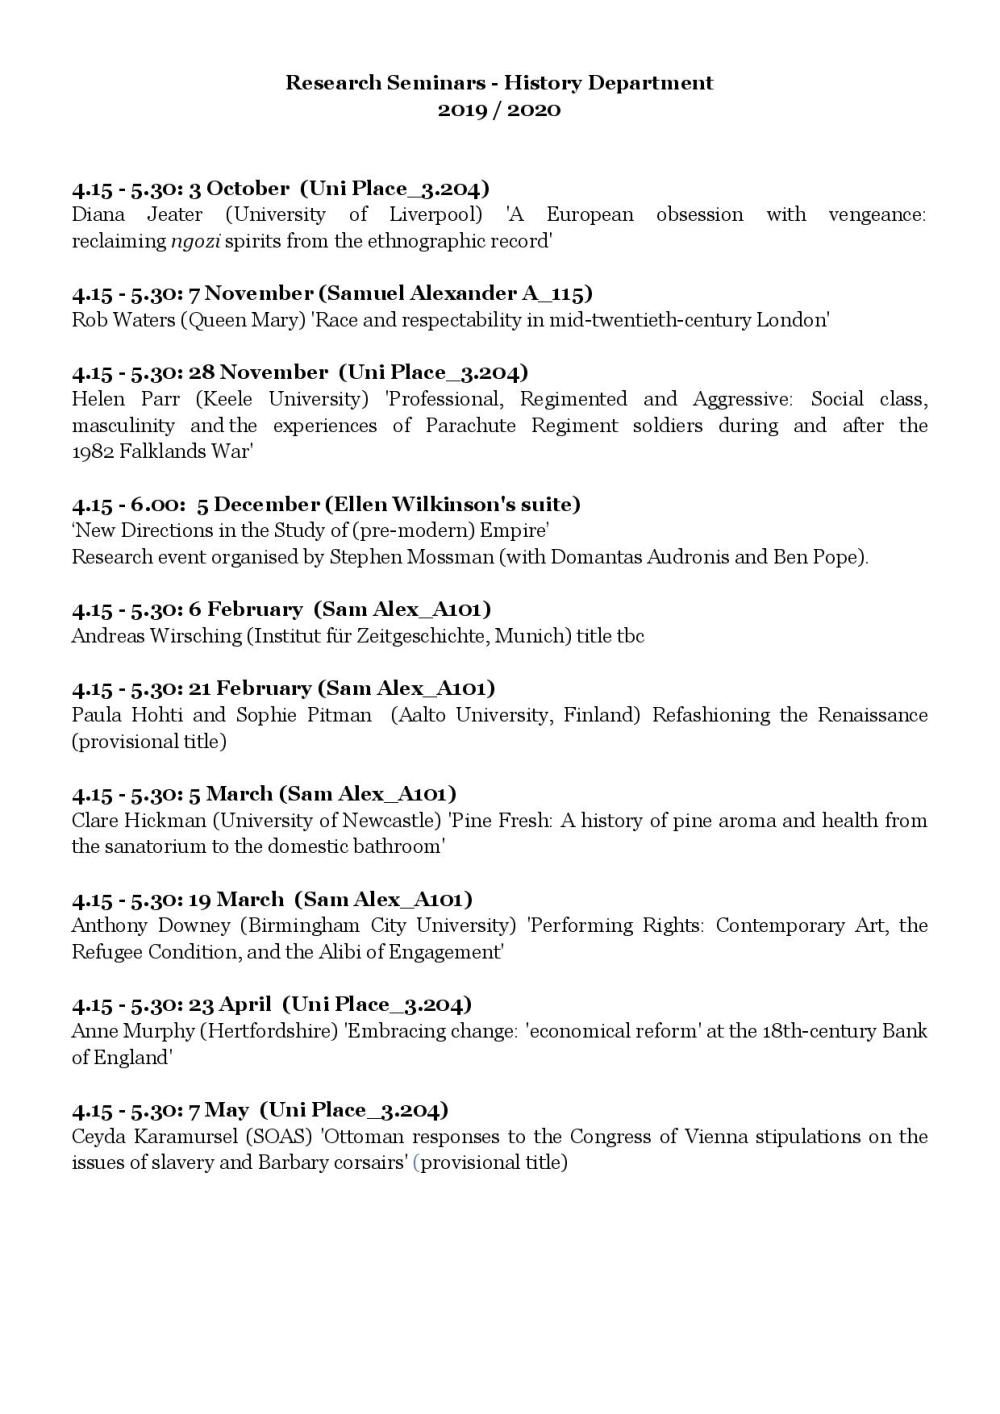 Research Seminars 2019-20-page-001.jpg